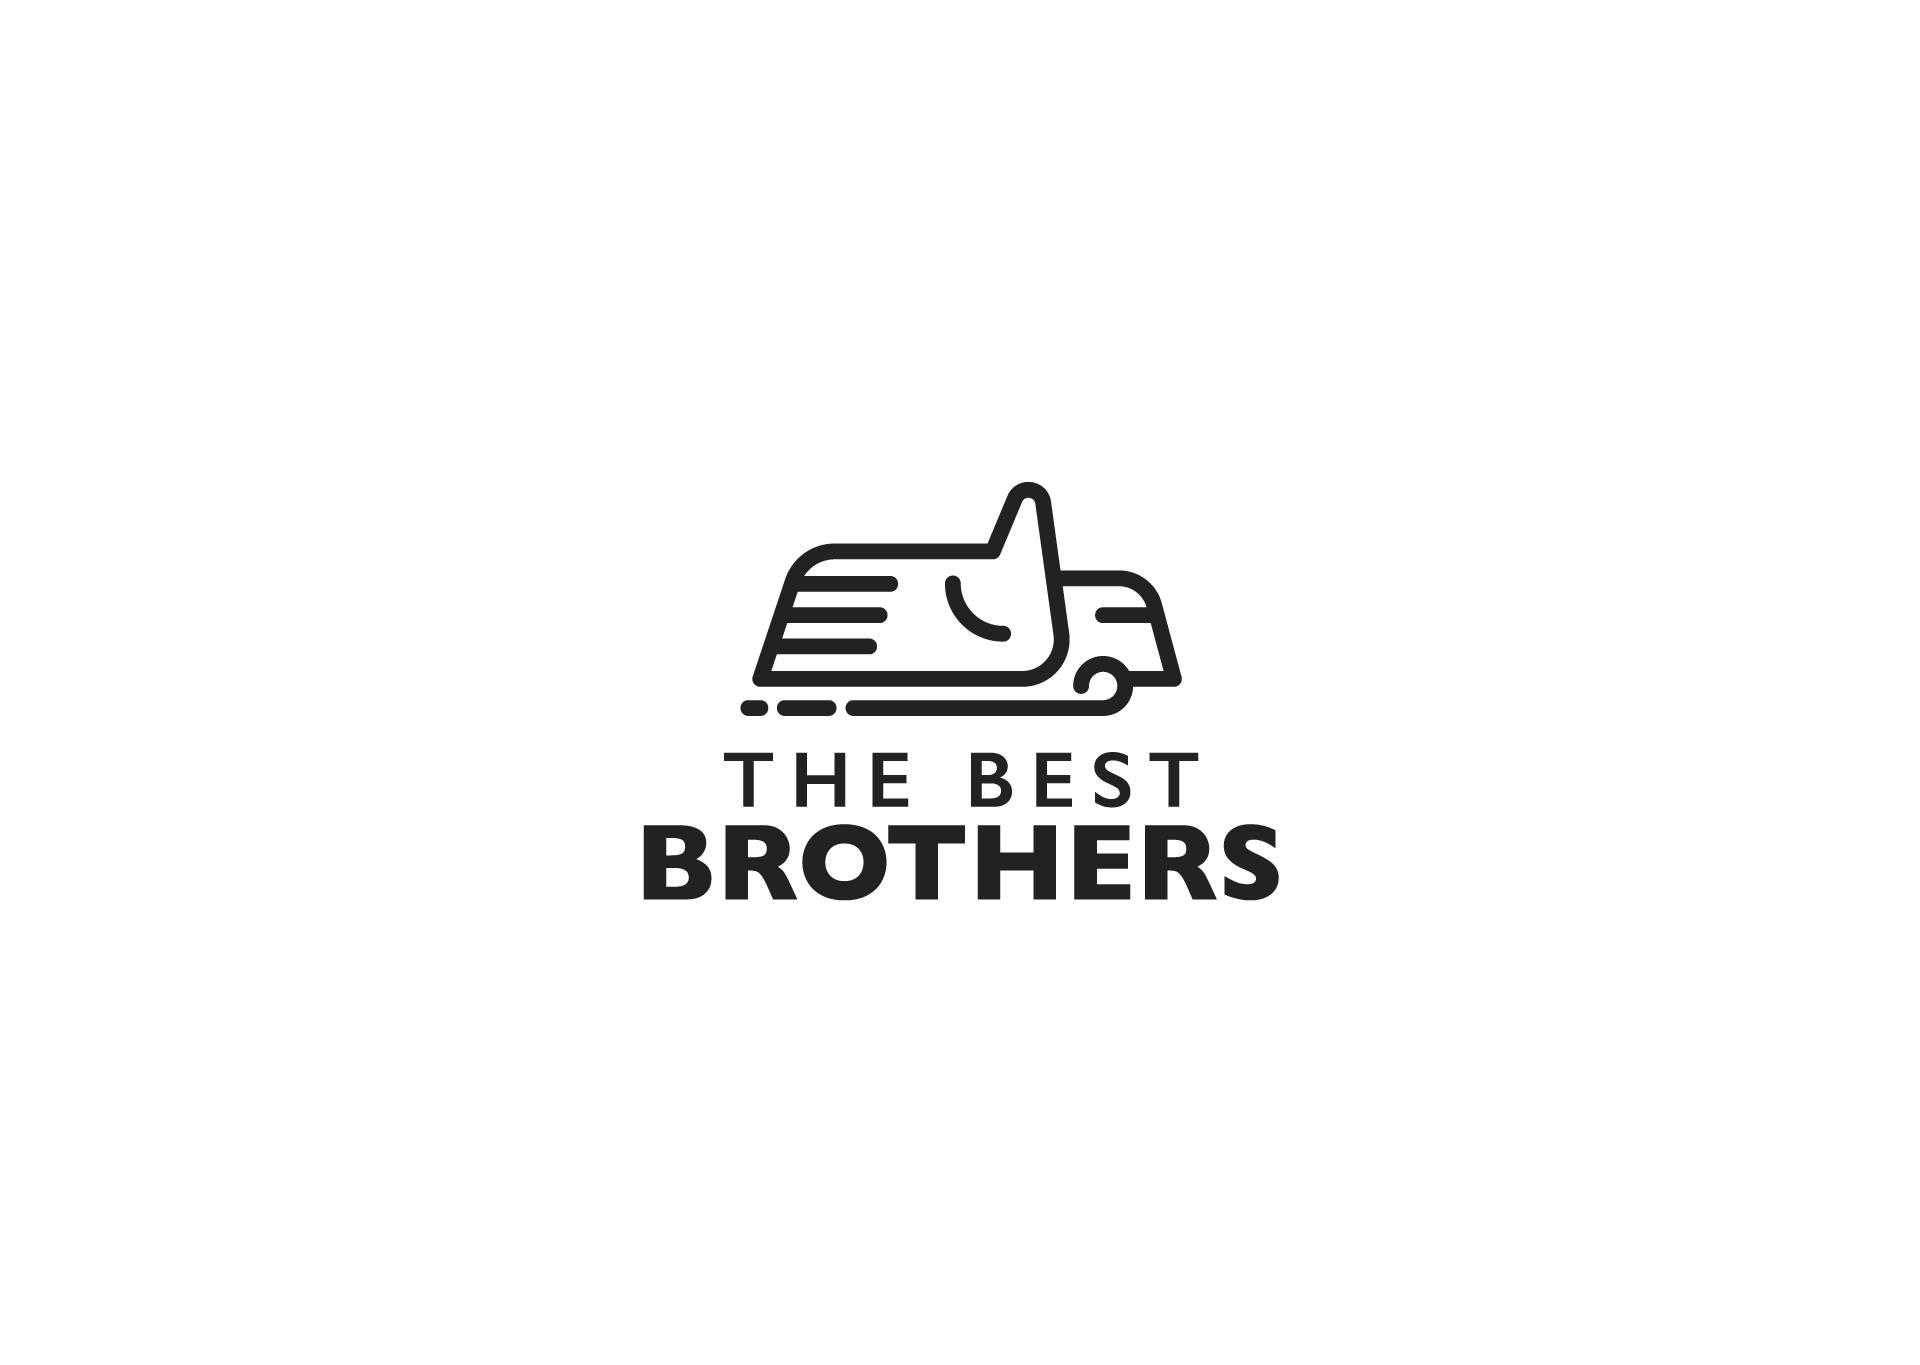 The best brothers logo, ლოგოს დამზადება, ლოგოს დიზაინი, ლოგოების შექმნა, ლოგოების დამზადება, ლოგოს დამზადების ფასი,  ბრენდინგი, ბანერების დამზადება, ლოგოტიპის შექმნა, ლოგოტიპების დიზაინი, ოპტიმიზაცია, facebook დიზაინი, ვებგვერდის დიზაინი, ლოგოების დიზაინი, ლოგოტიპების დამზადება, saitebis damzadeba, logoebis damzadena, saitis damzadeba, logos damzadeba,